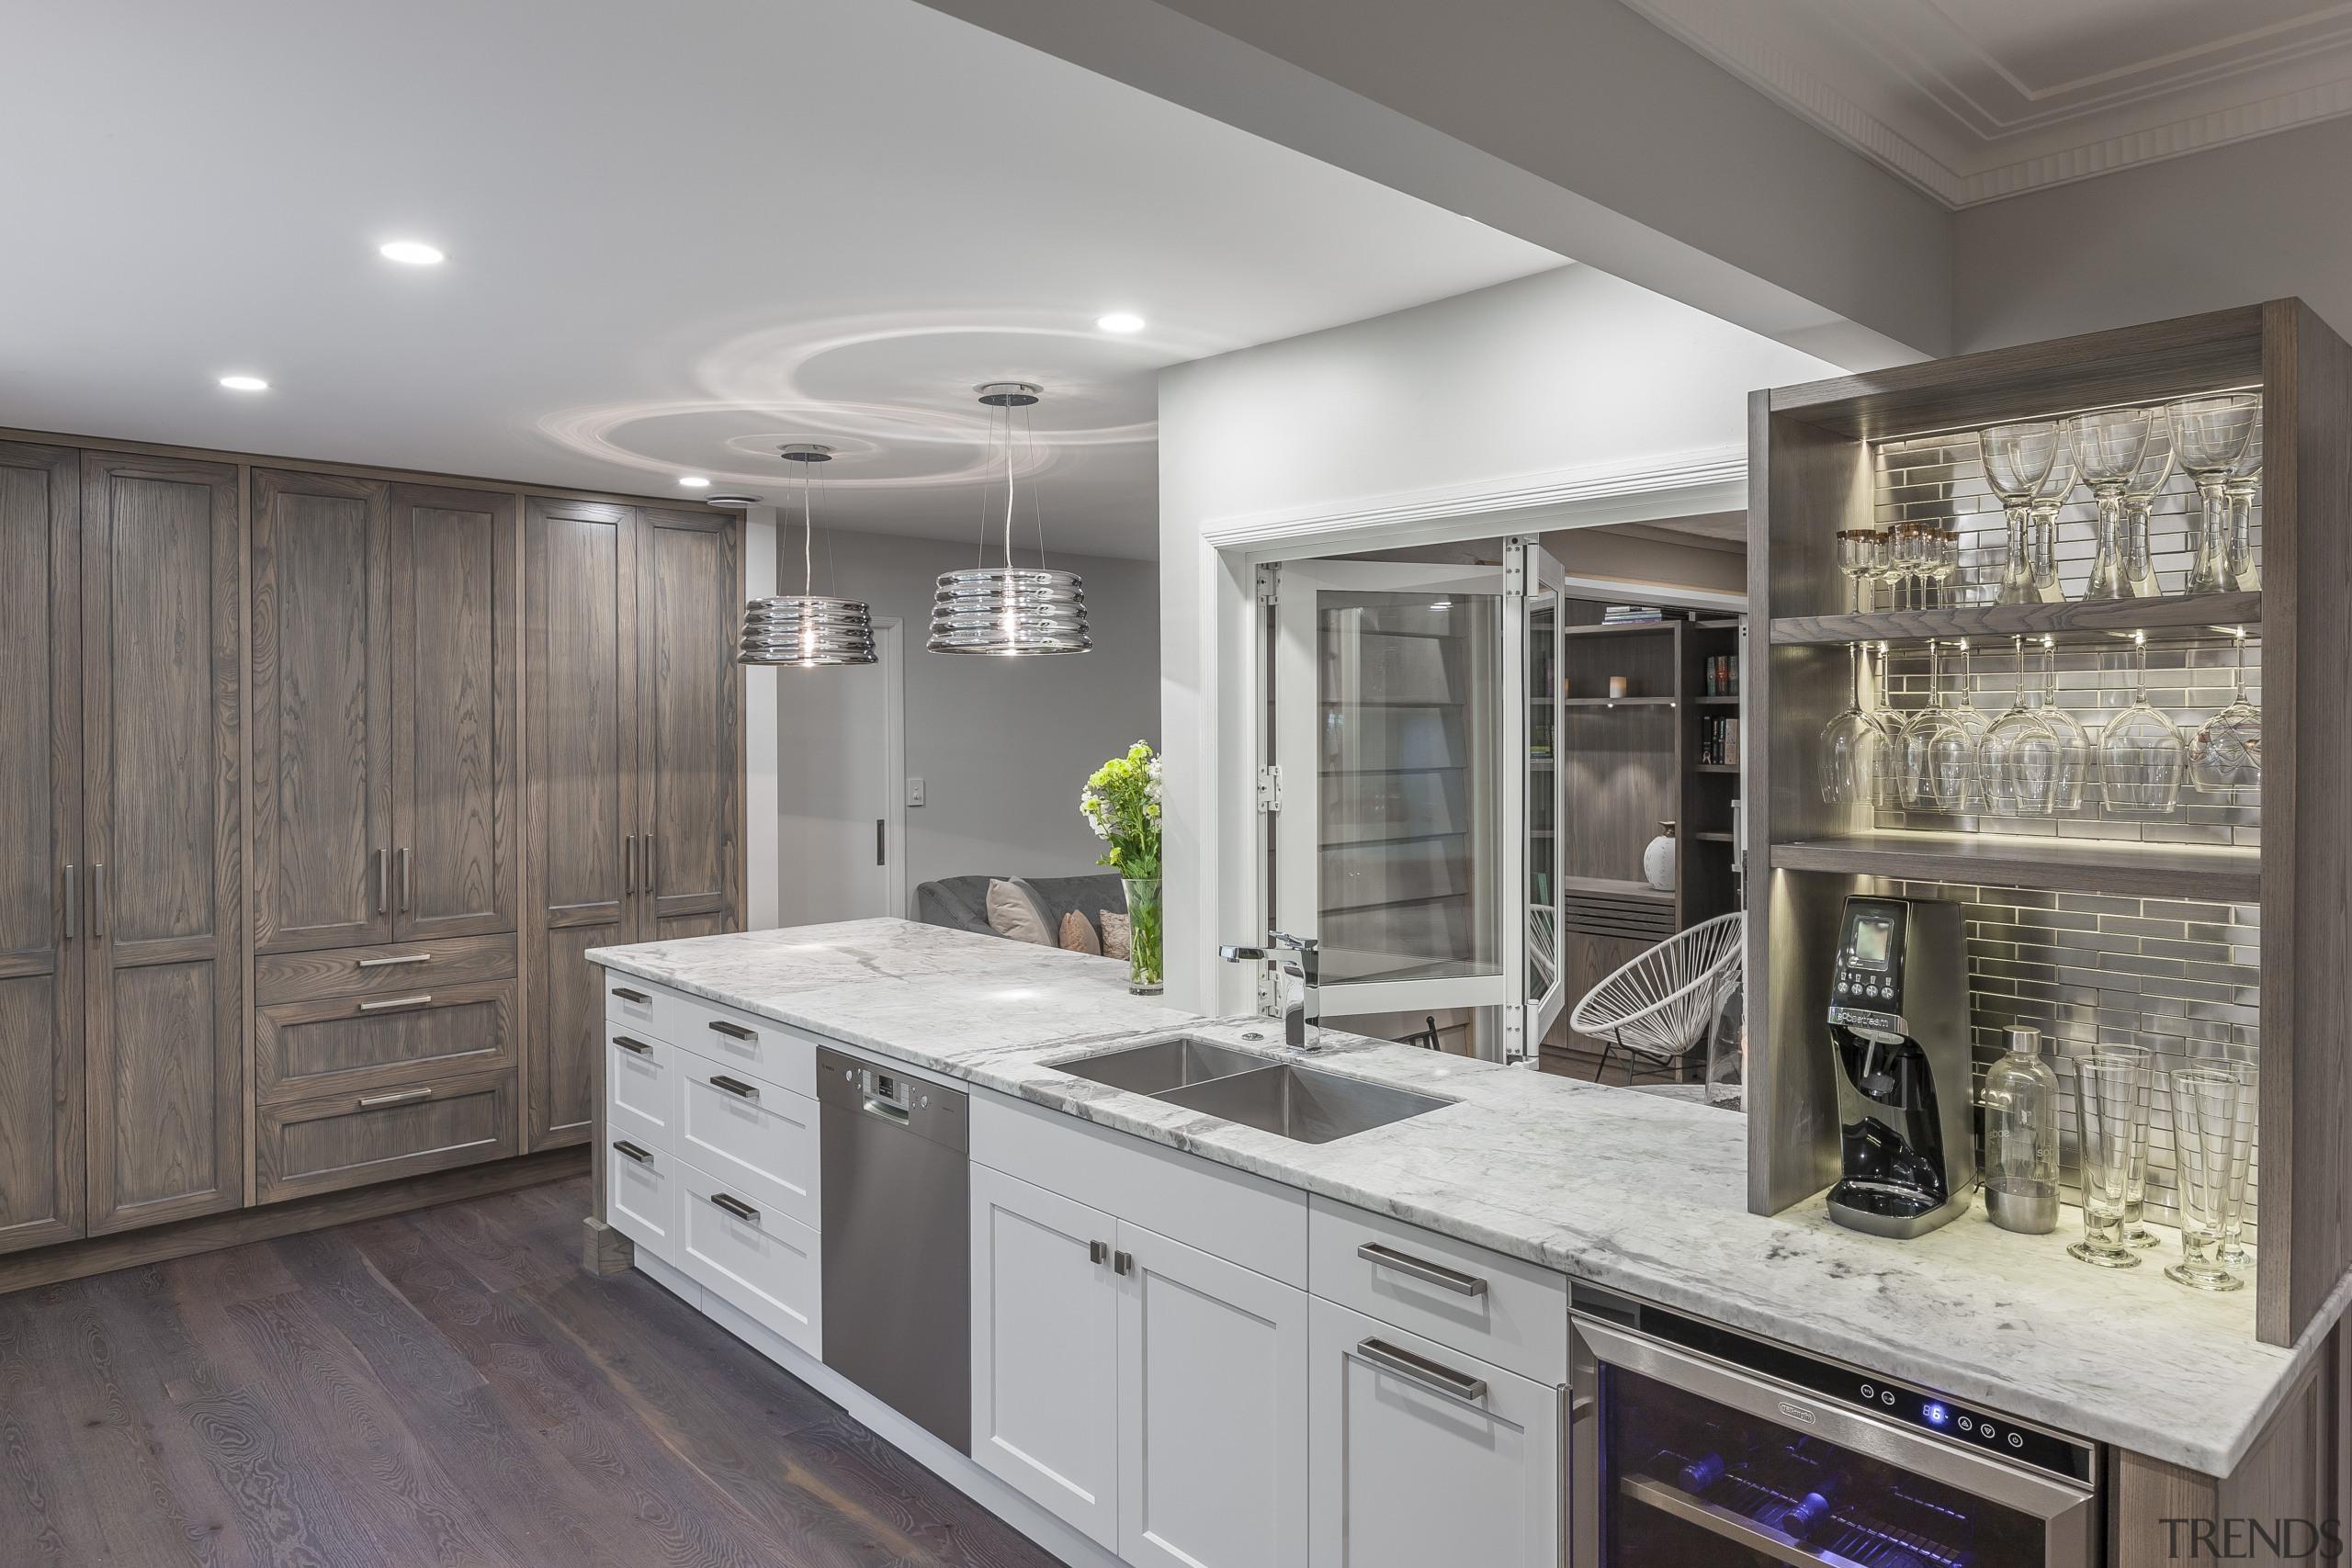 Sunnyhills II - cabinetry | countertop | cuisine cabinetry, countertop, cuisine classique, interior design, kitchen, room, gray